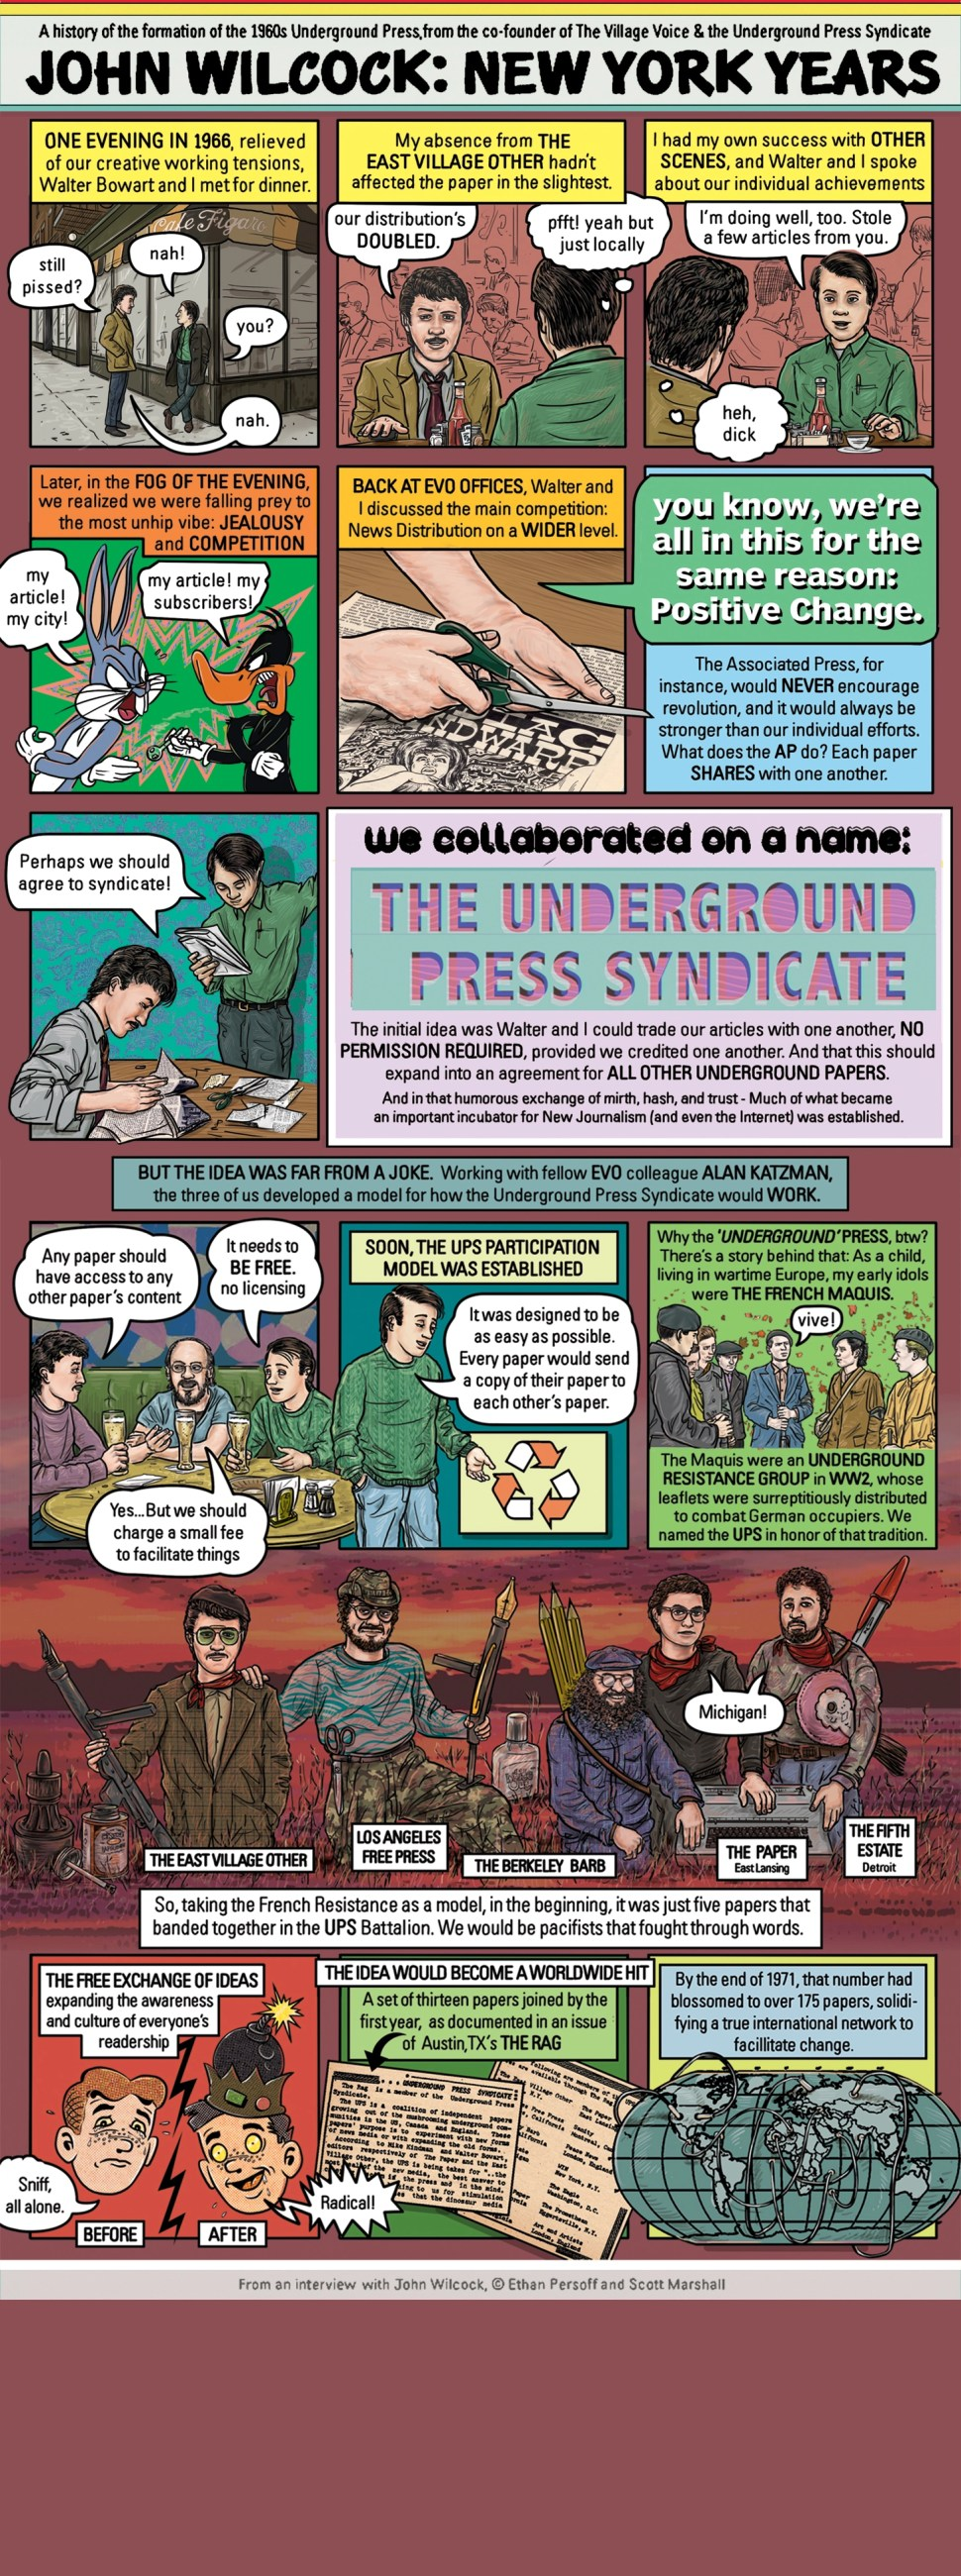 The Underground Press Syndicate (UPS)